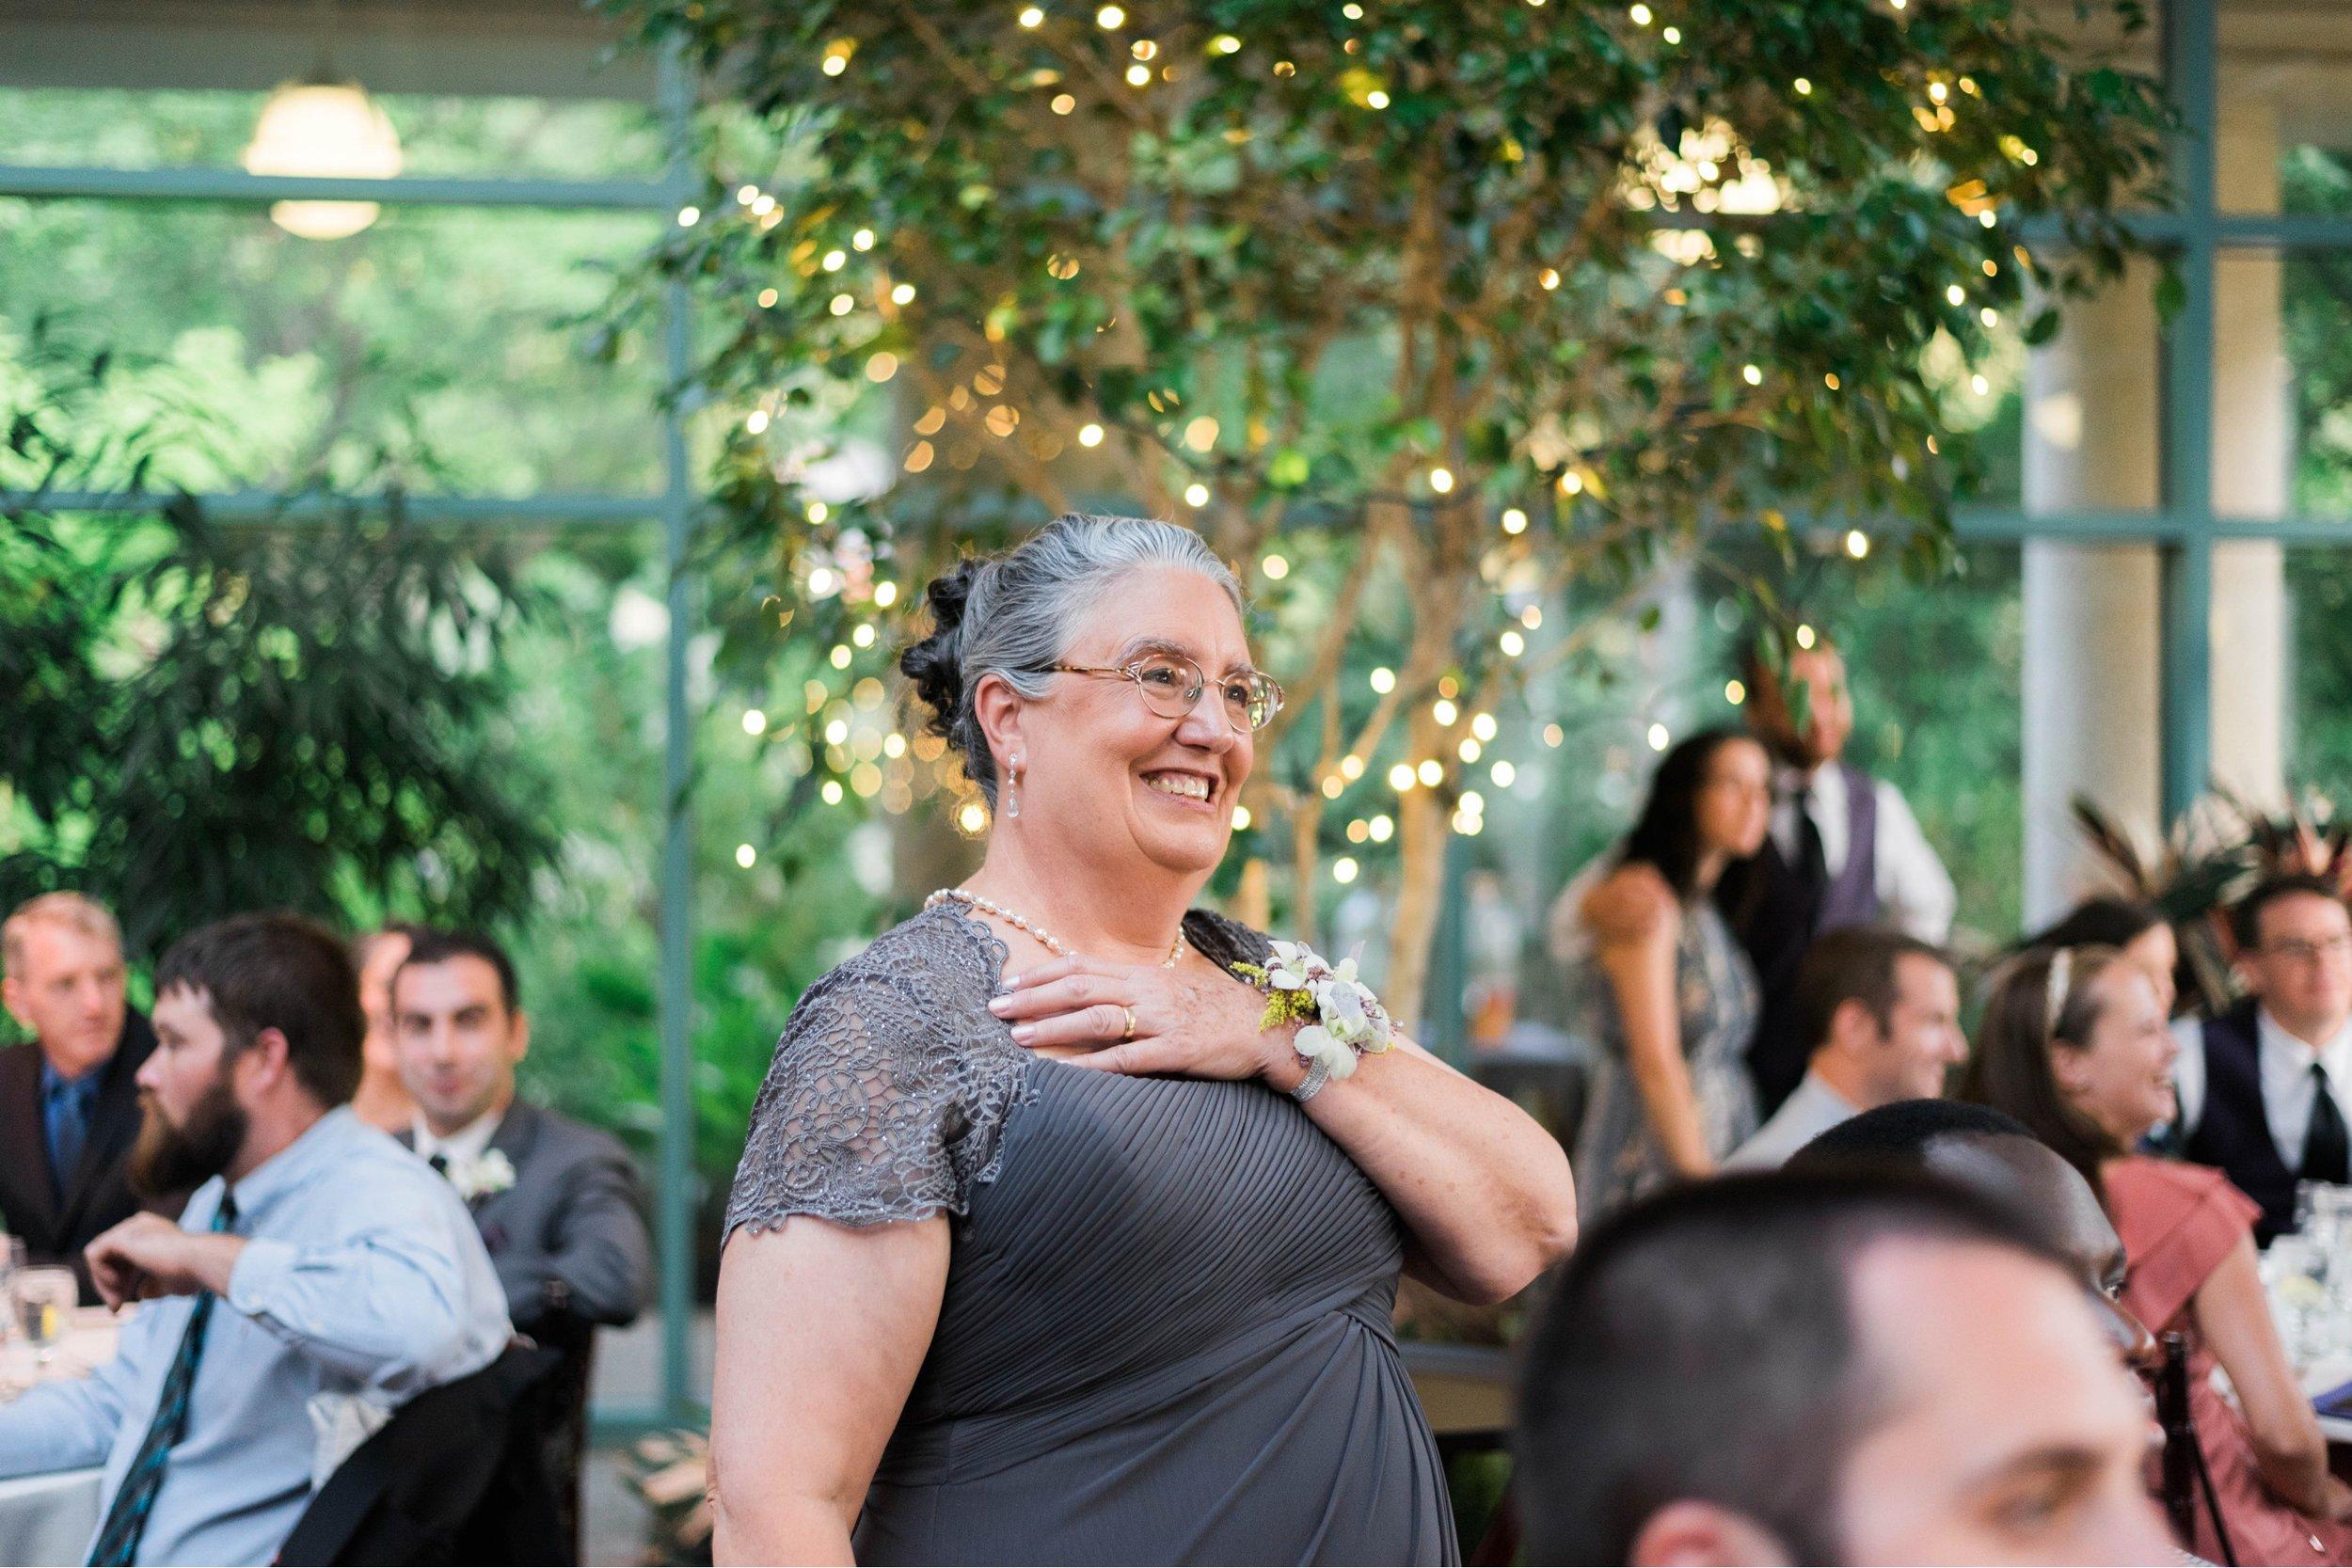 TheAtriumatMeadowlark_Virginiawedding photographer_lynchburgweddingphotographer_DCweddingPhotographer_KristinAaron 46.jpg